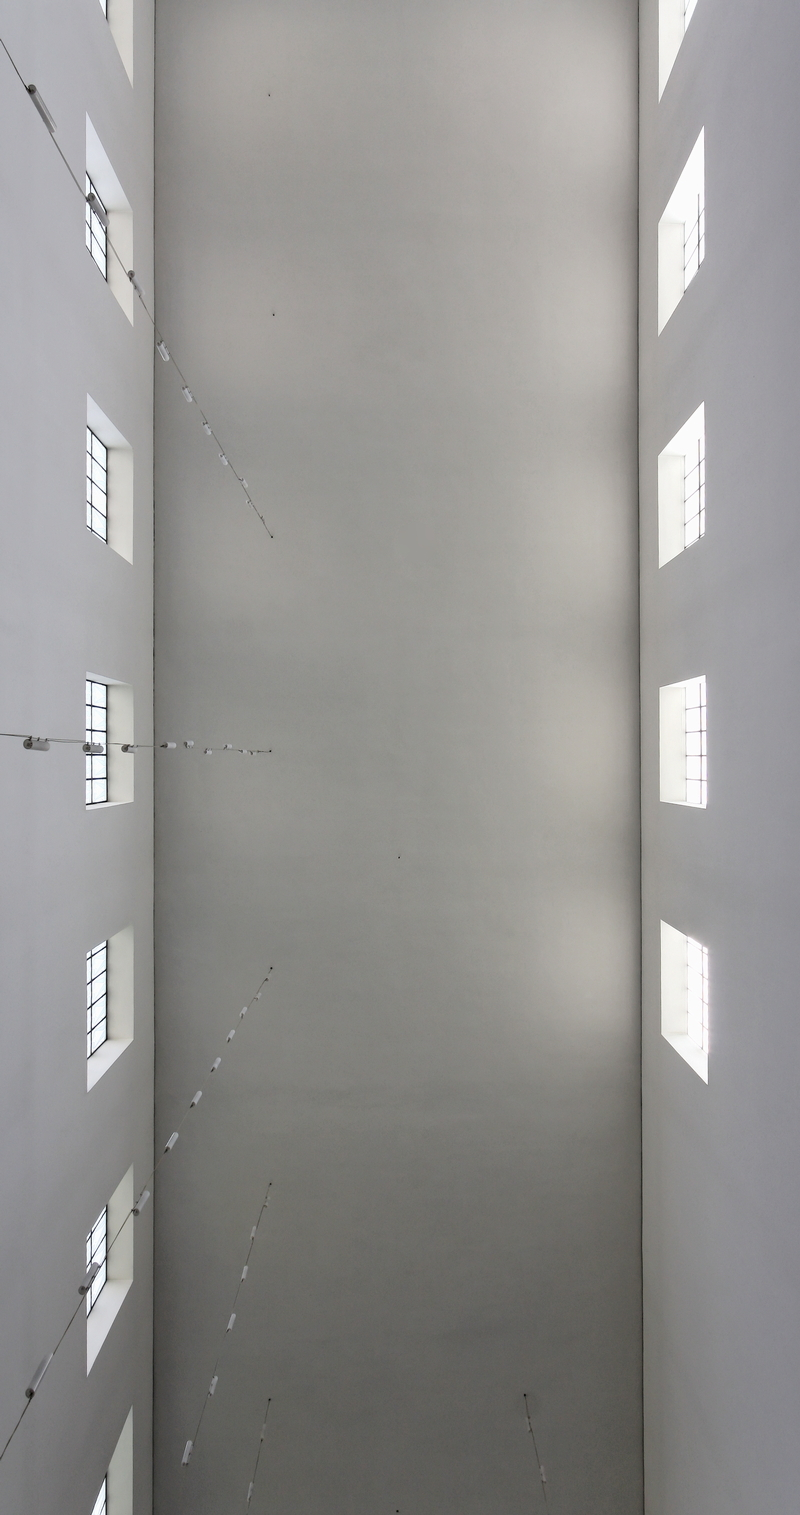 St. Fronleichnam, Aachen: Ceiling